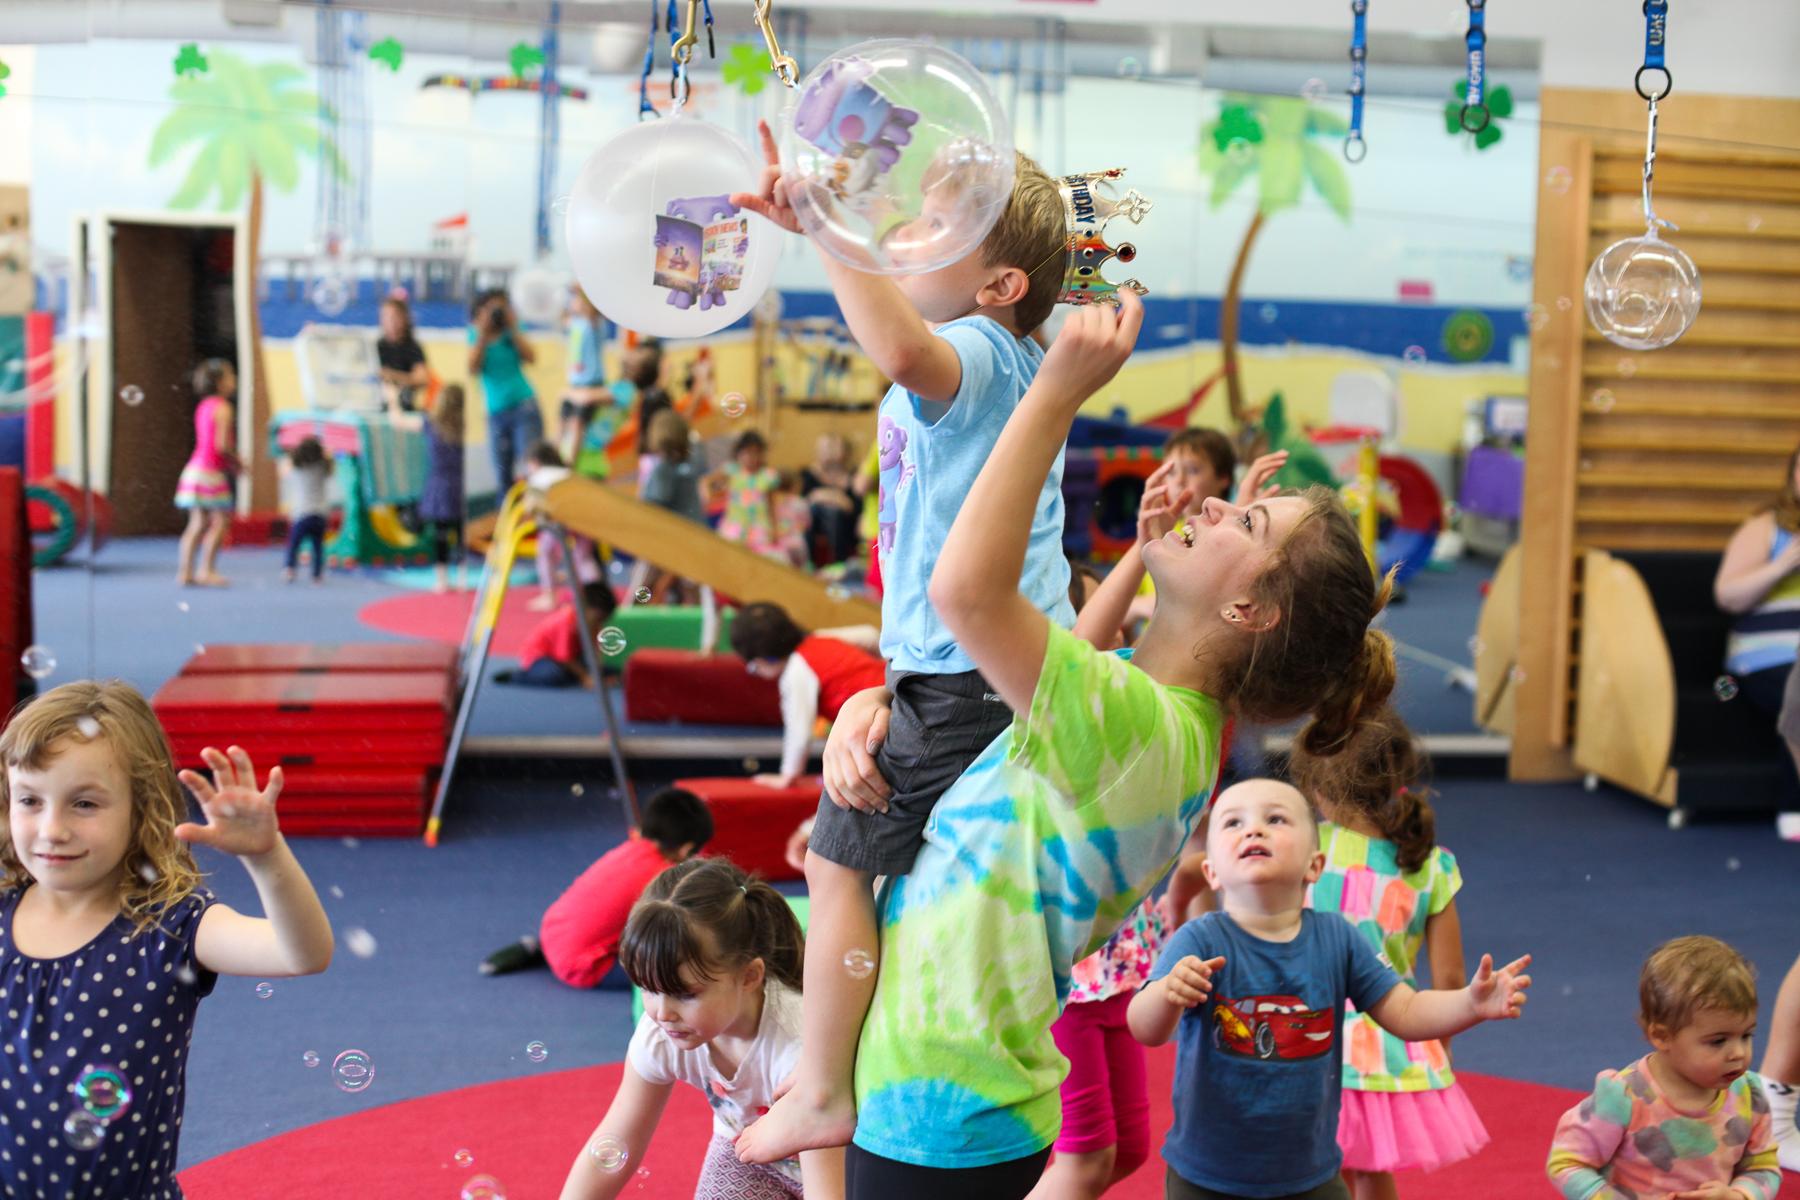 Best Kids Birthday Party Location 2016: My Gym